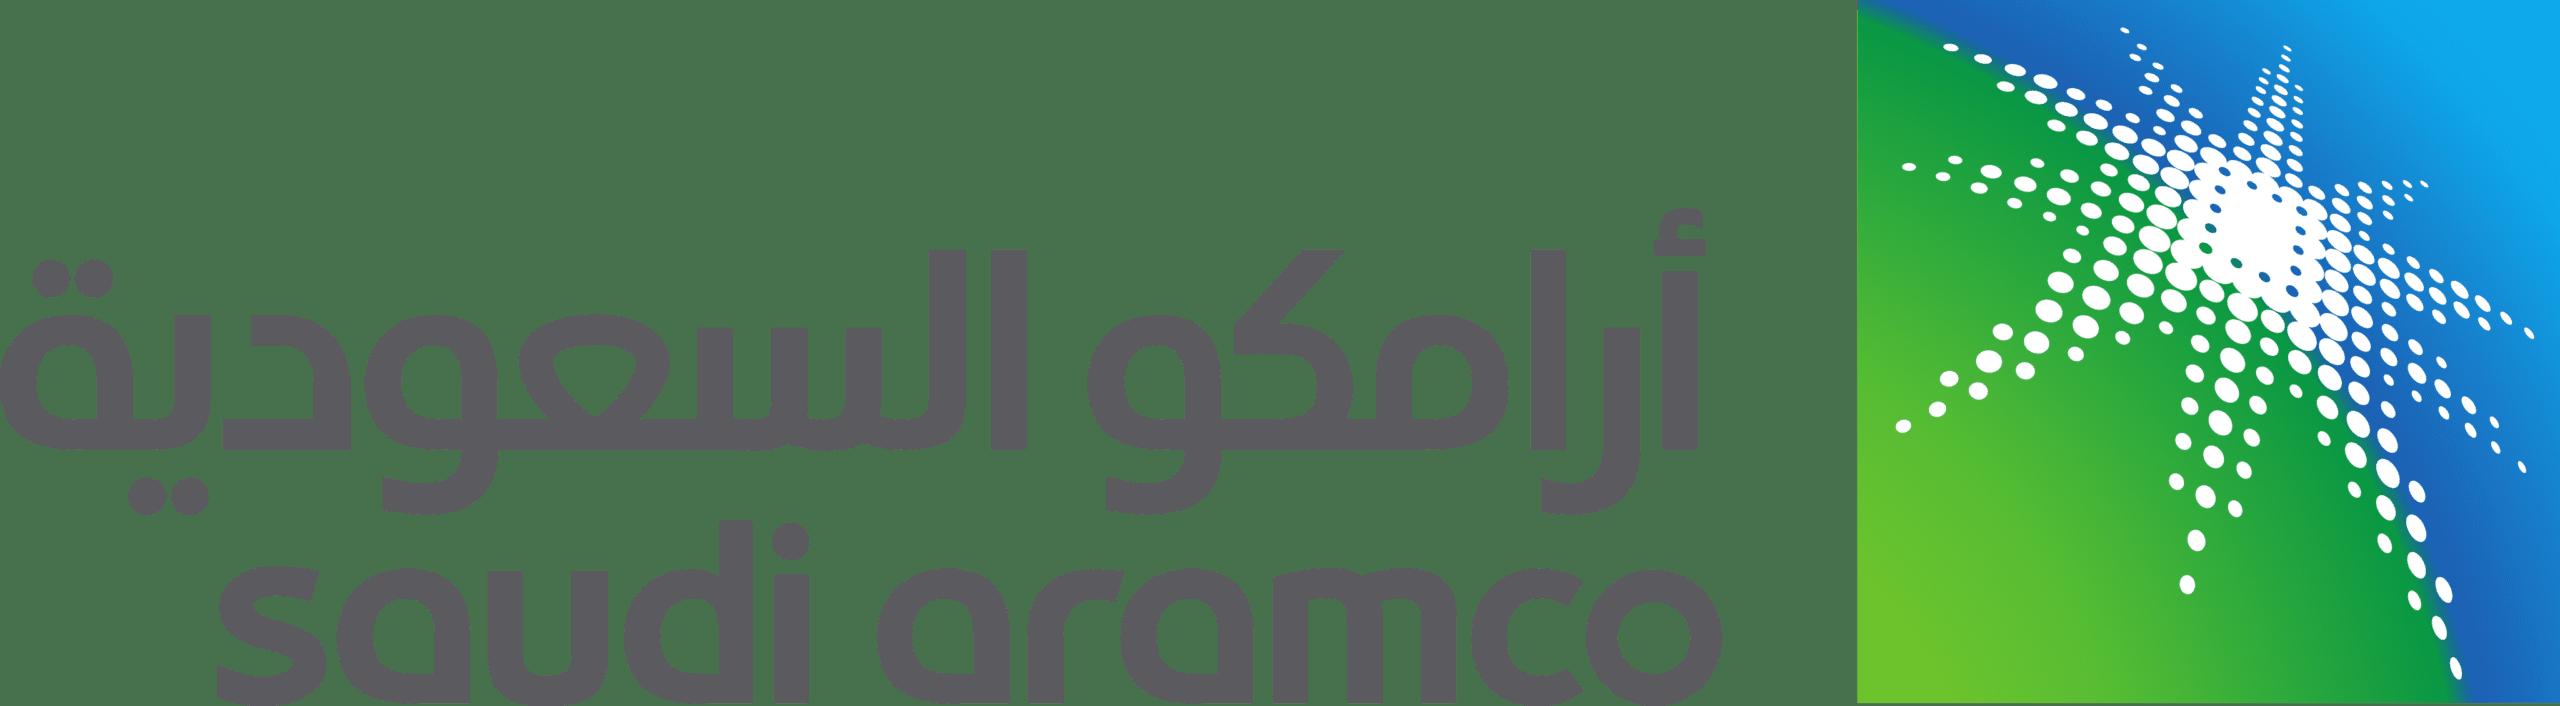 saudi aramco   top 10 richest companies in the world